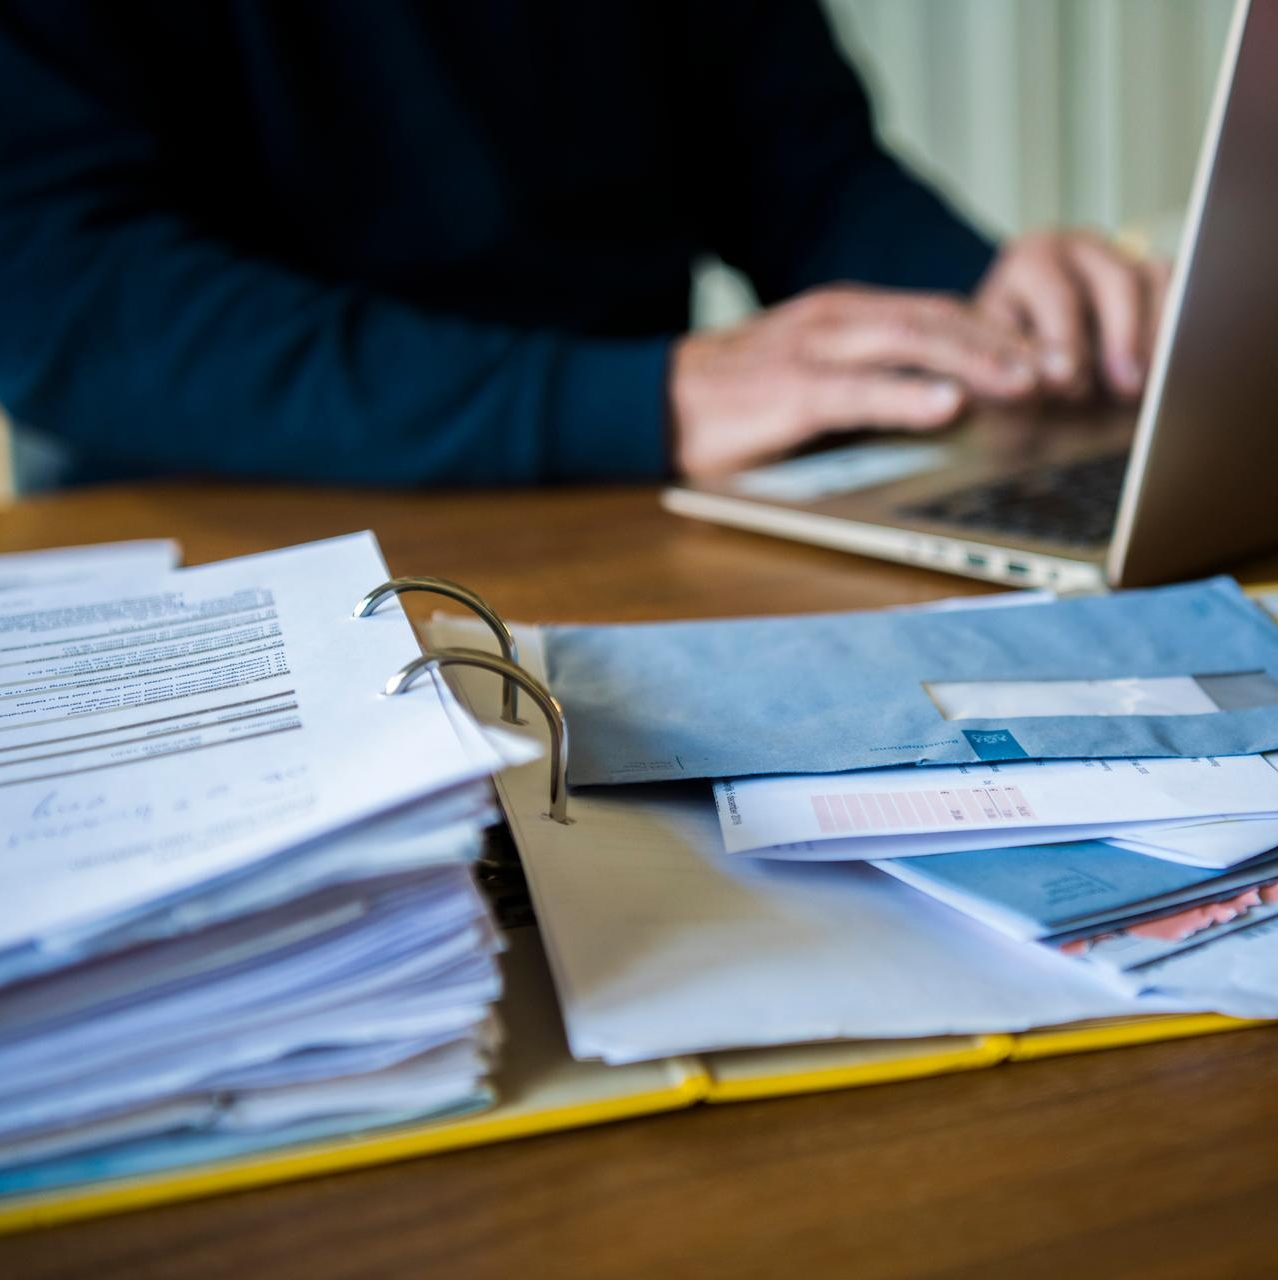 Man doet aangifte inkomstenbelasting op laptop.